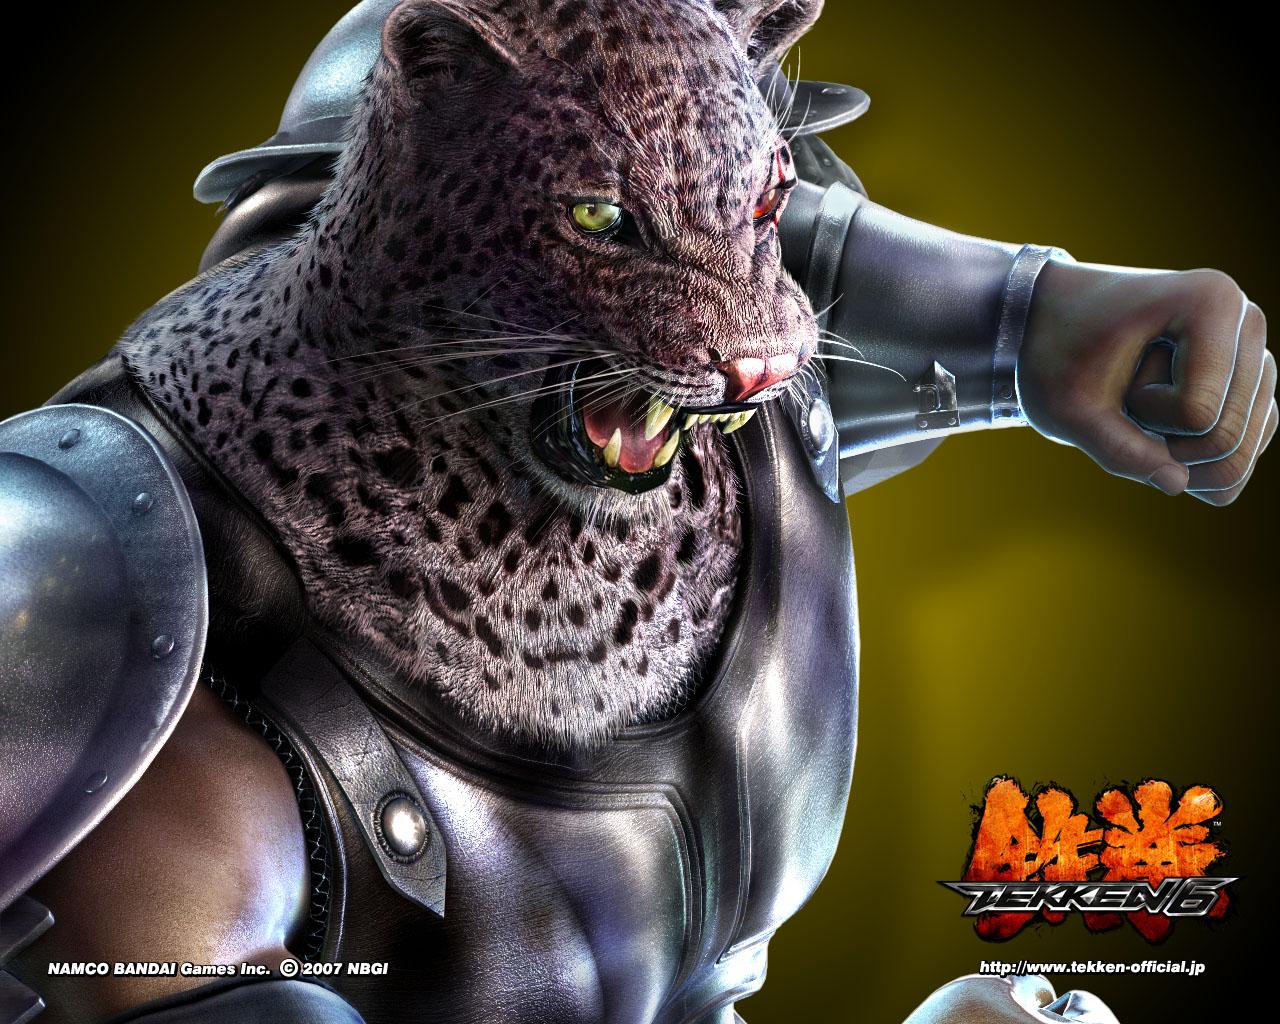 HD Wallpapers Armor King Tekken 6